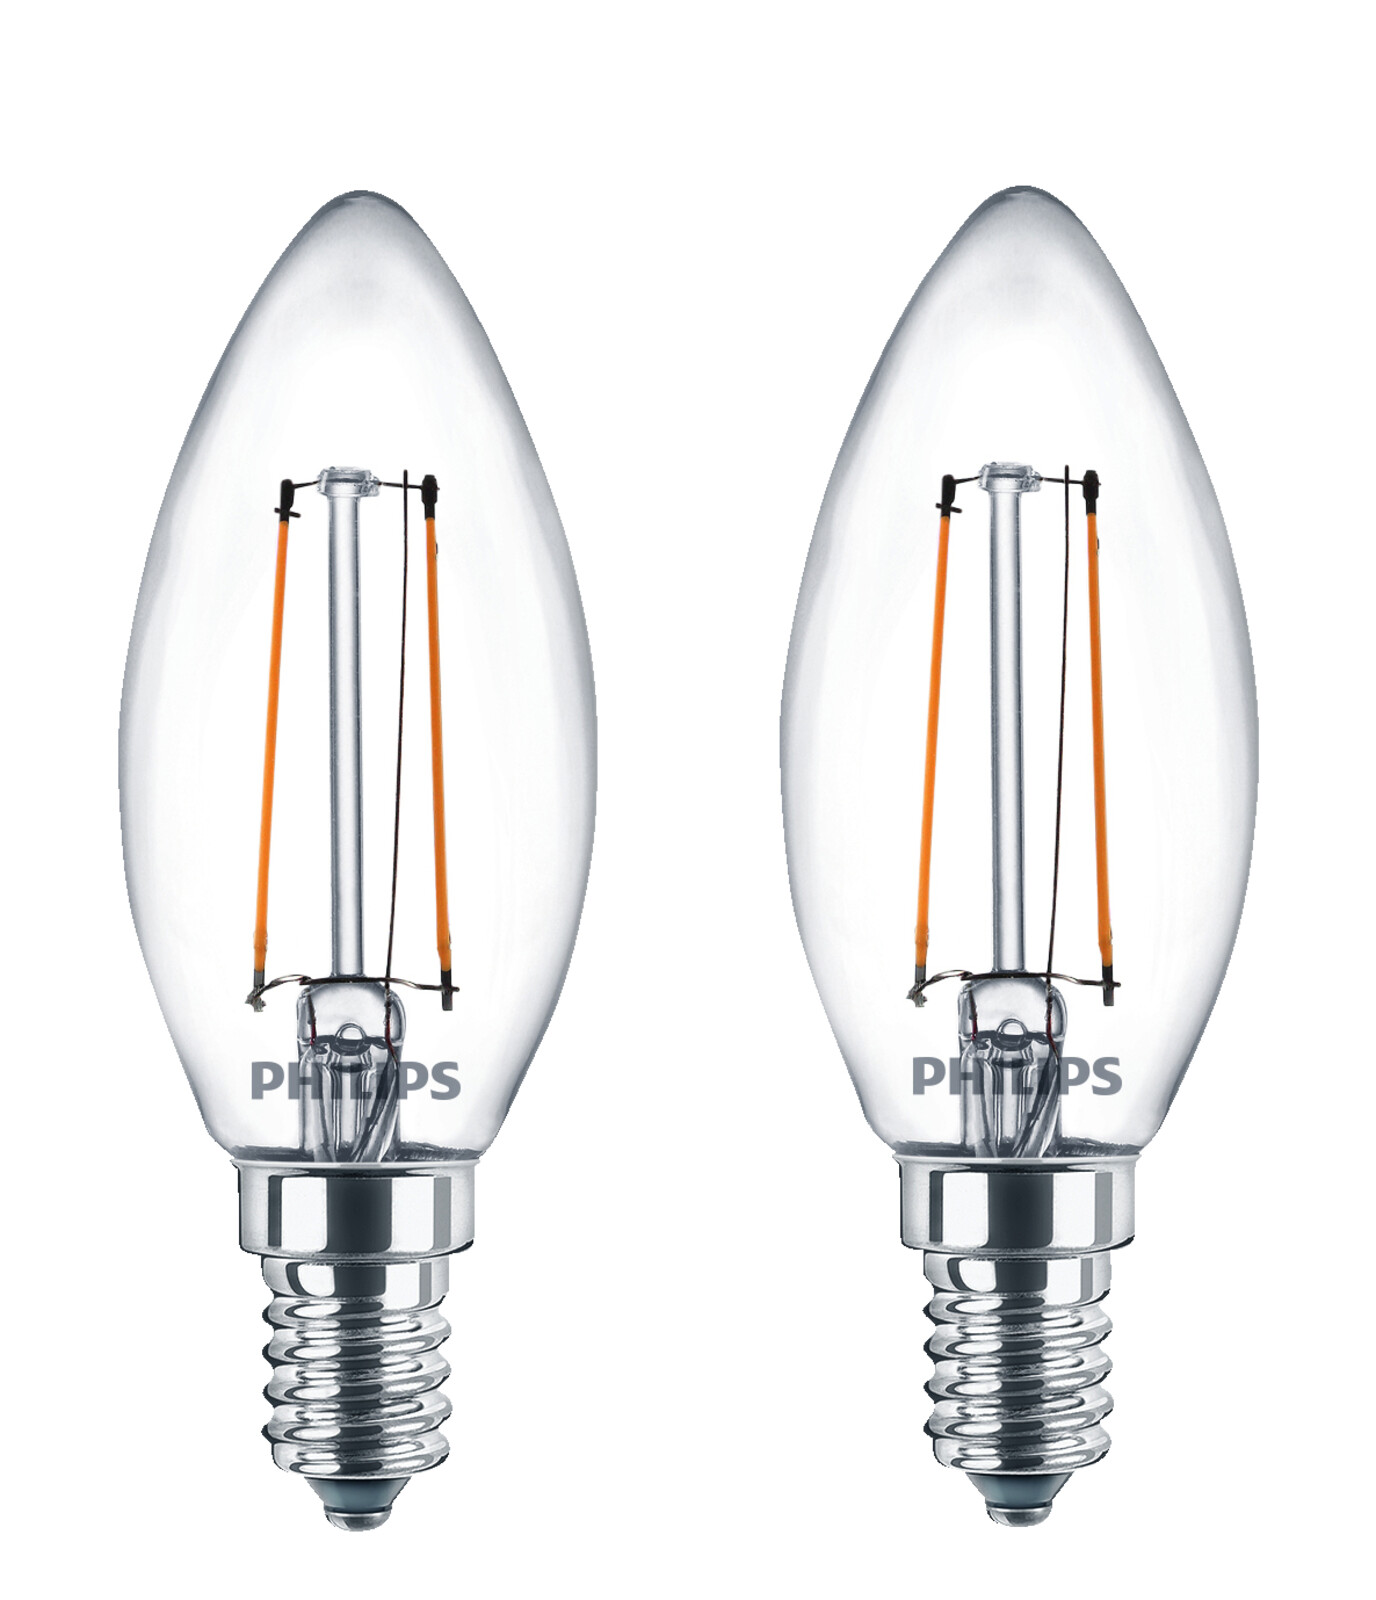 philips 929001238371 ledclassic led leuchtmittel e14 warmwei 2 watt 250 lumen ebay. Black Bedroom Furniture Sets. Home Design Ideas